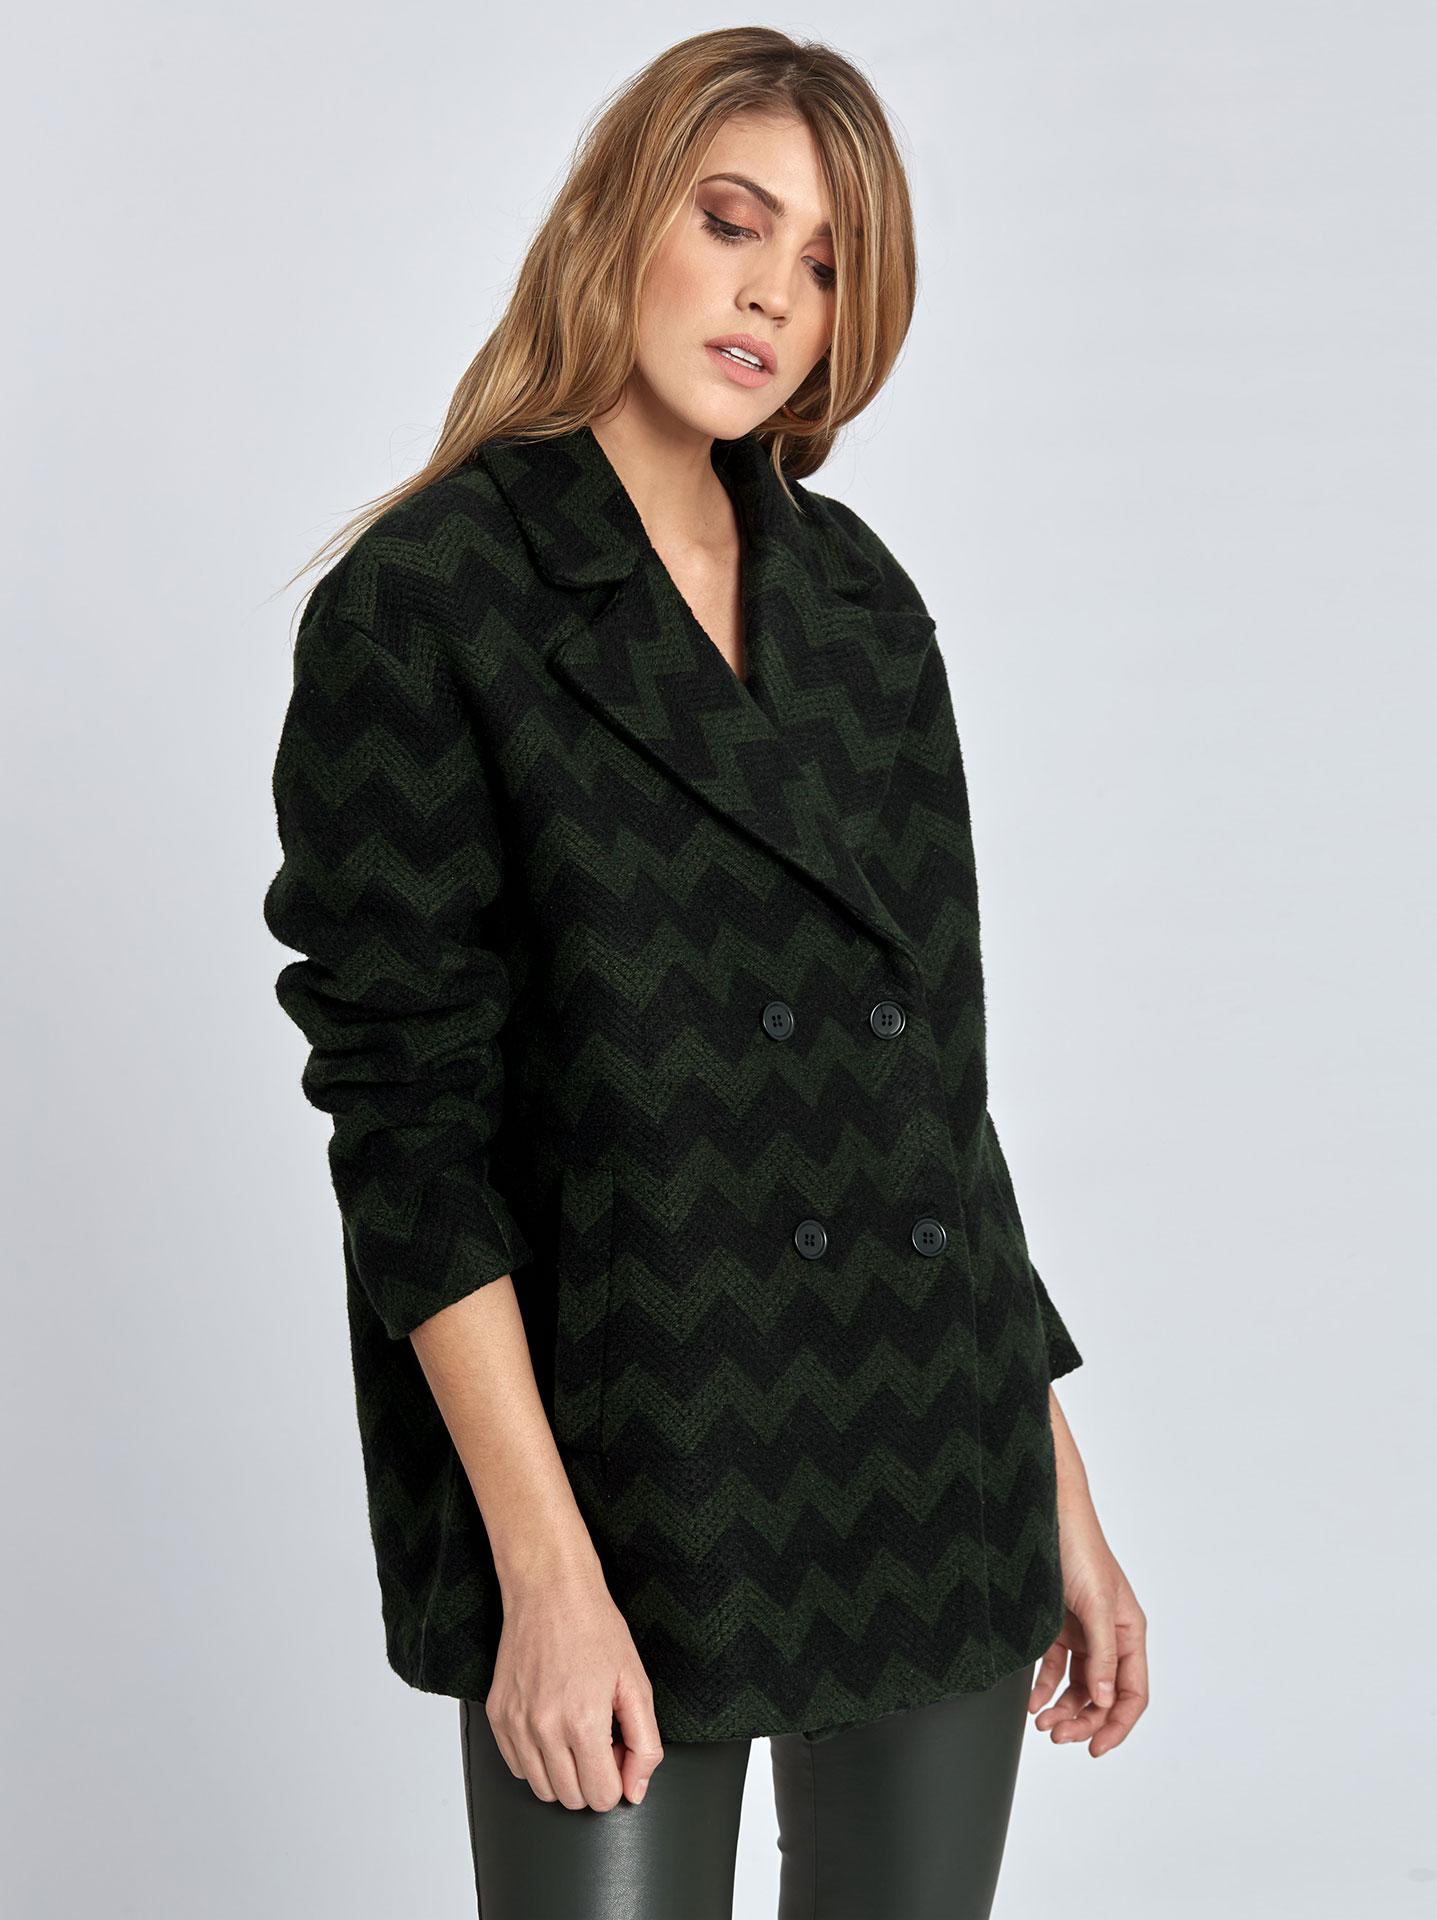 Oversized παλτό με ζικ ζακ σχέδιο σε πρασινο σκουρο 9e1fe9a81dc